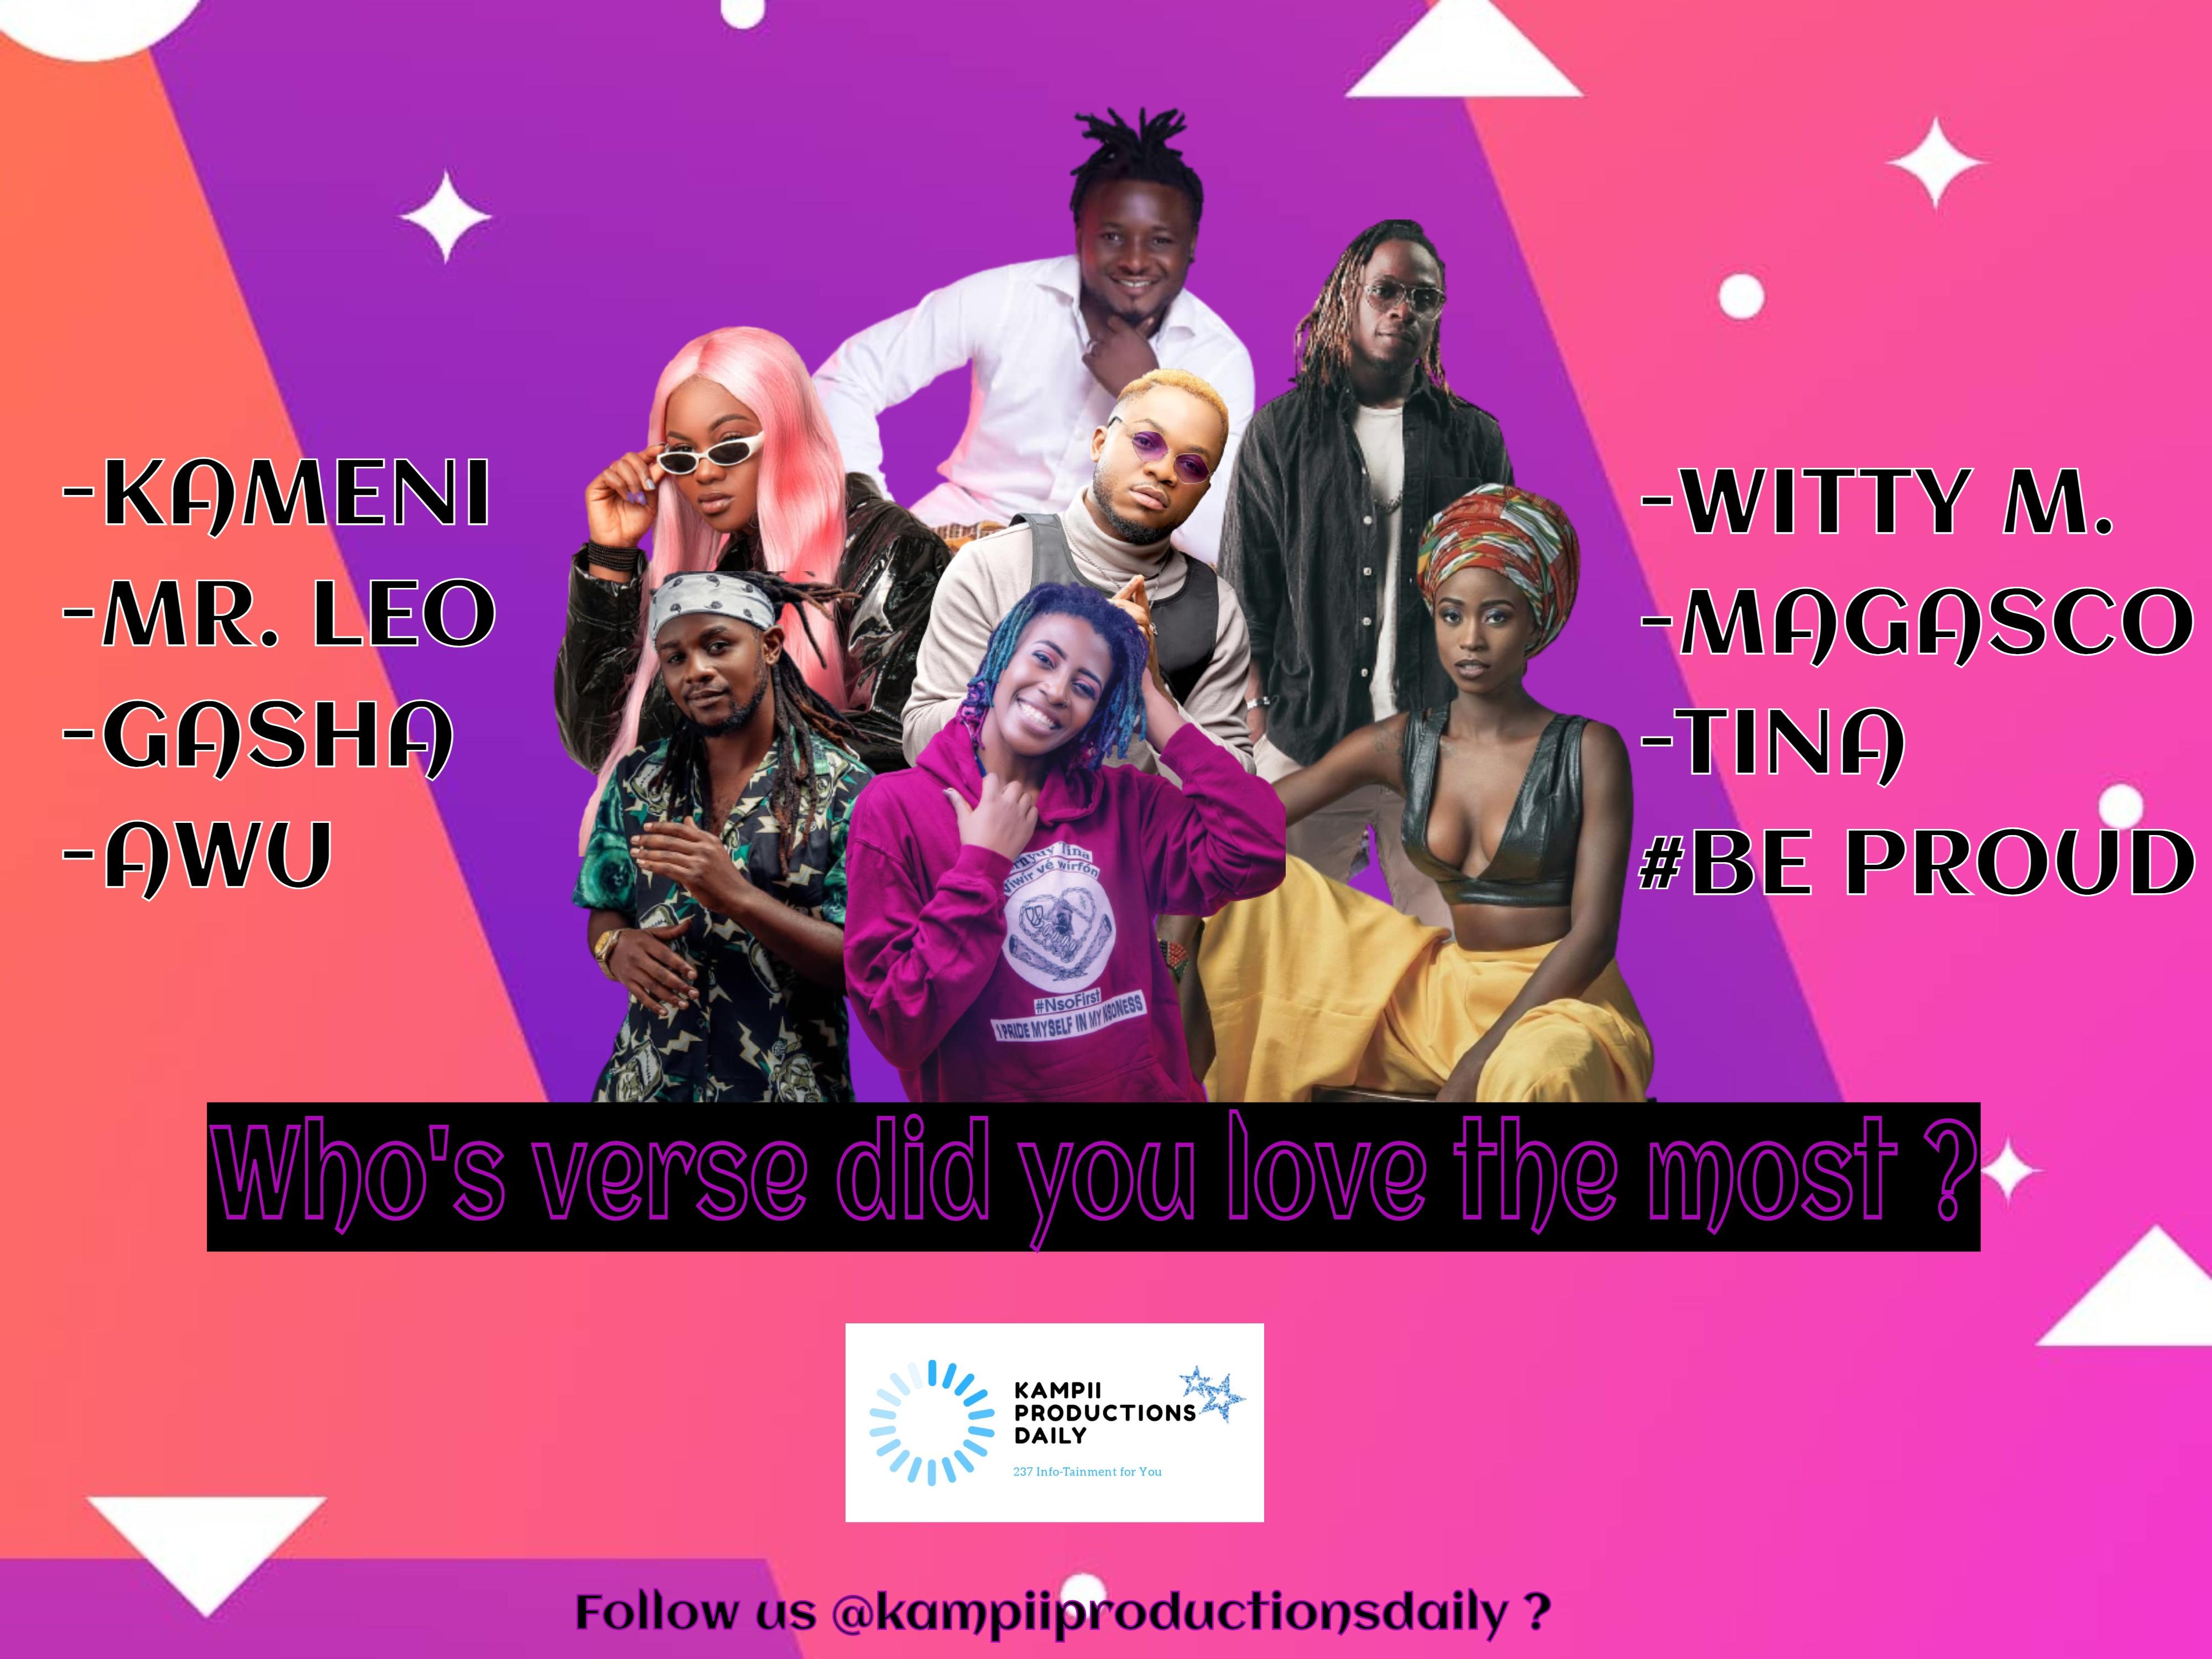 Watch BE PROUD REMIX ft Magasco, Vernyuy Tina, Awu, Kameni, Gasha, Mr. Leo